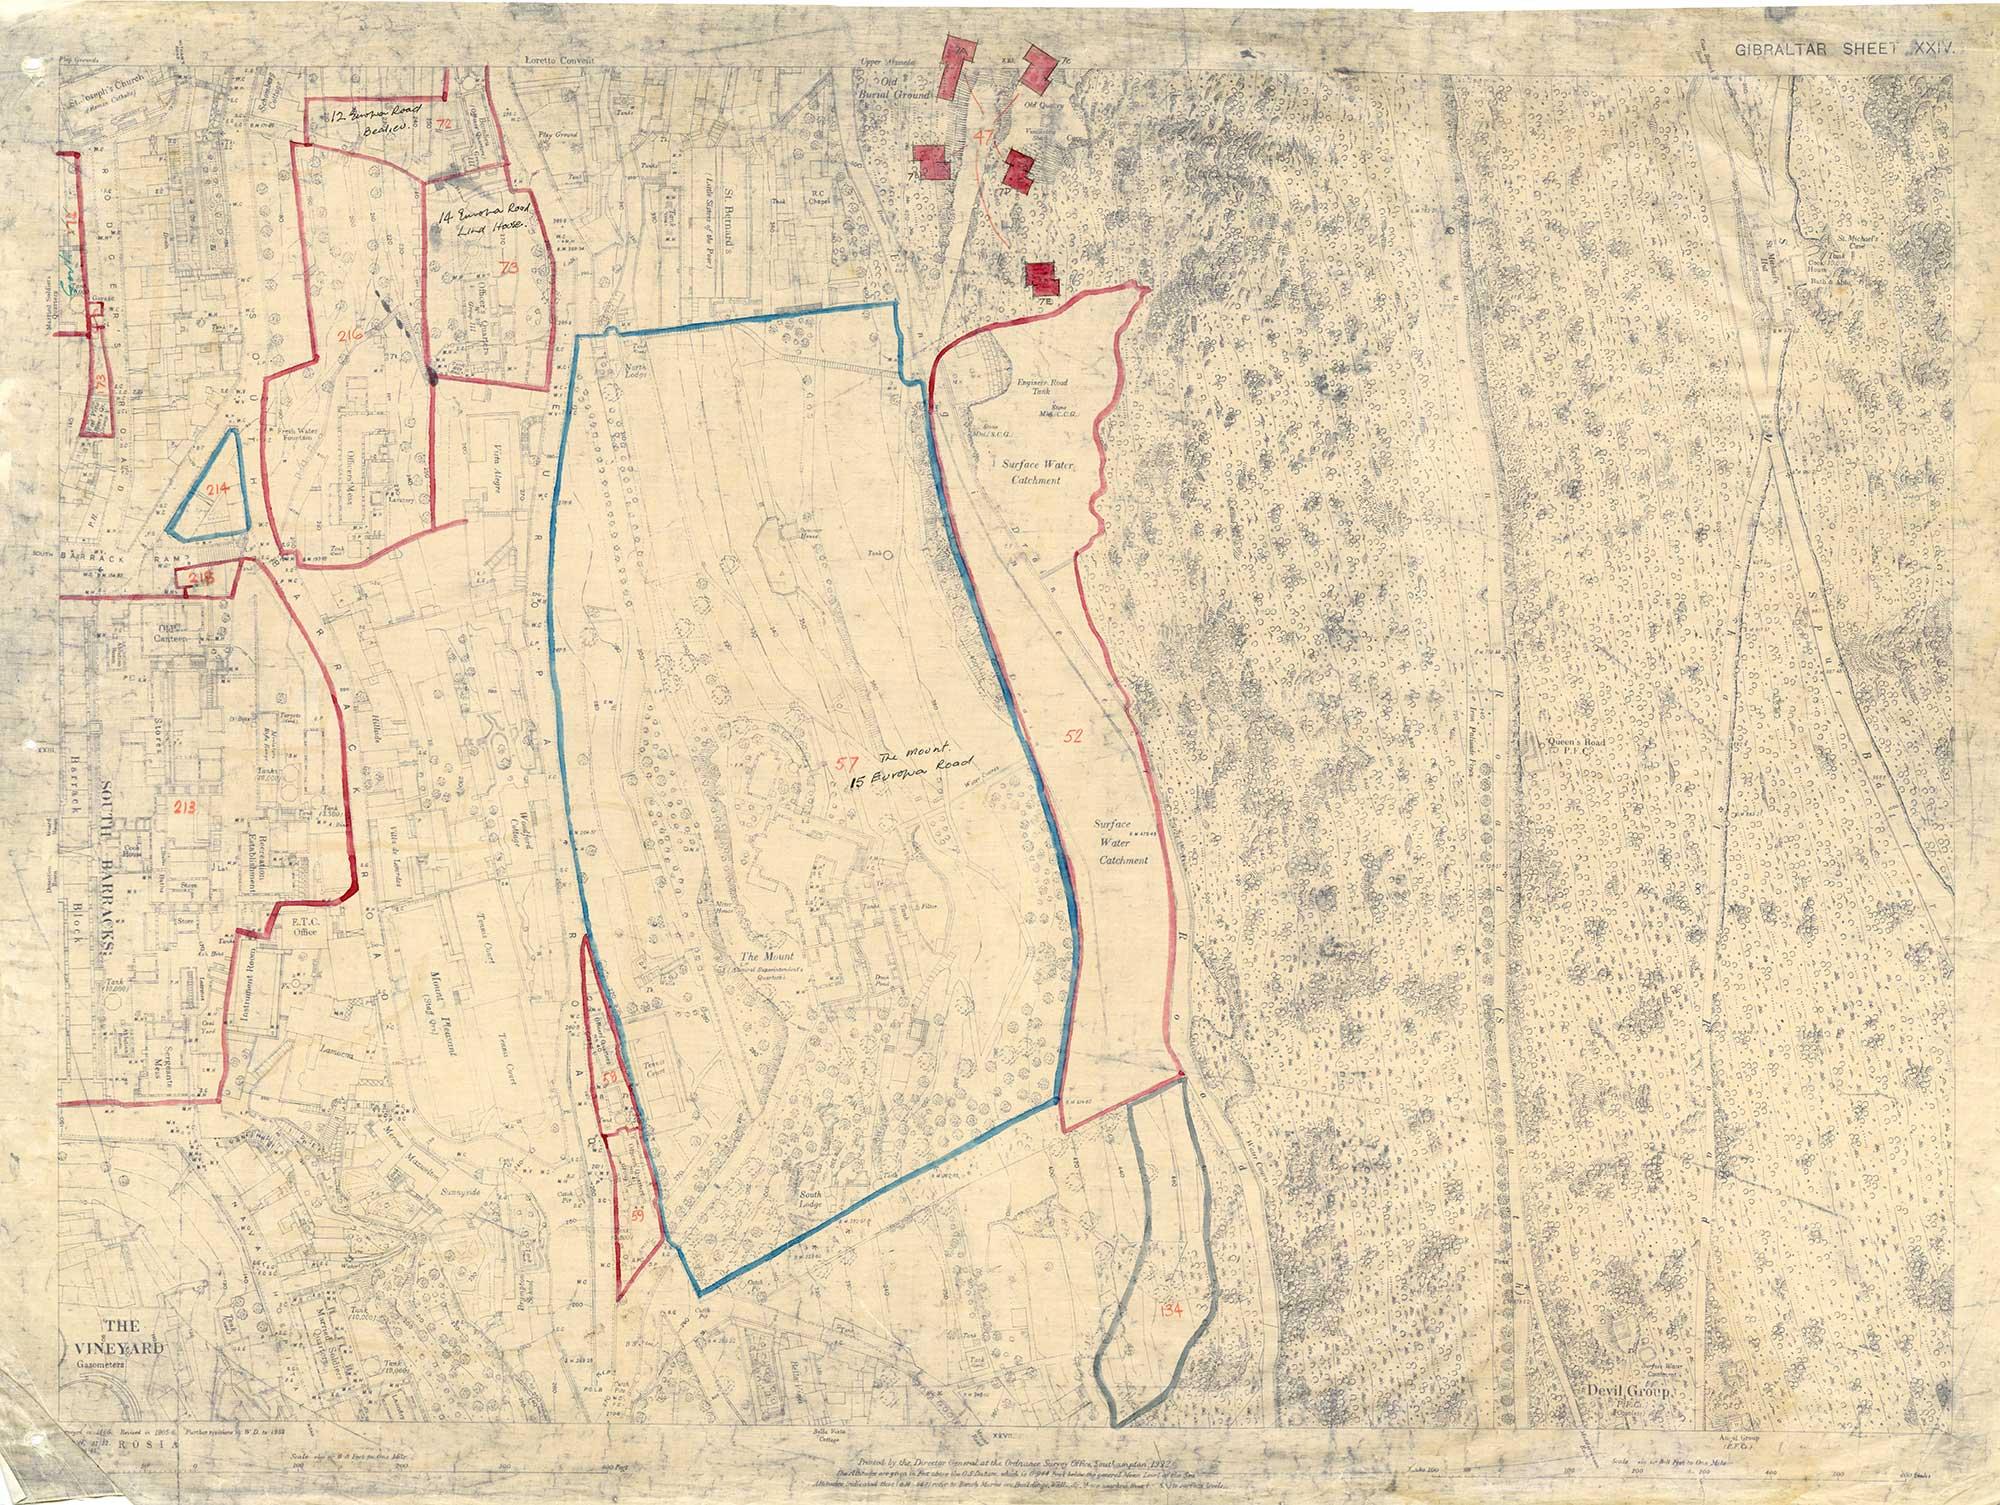 Map-36-OS-sheet-24-Loretto-Convent,-South-Barracks,-Devils-G